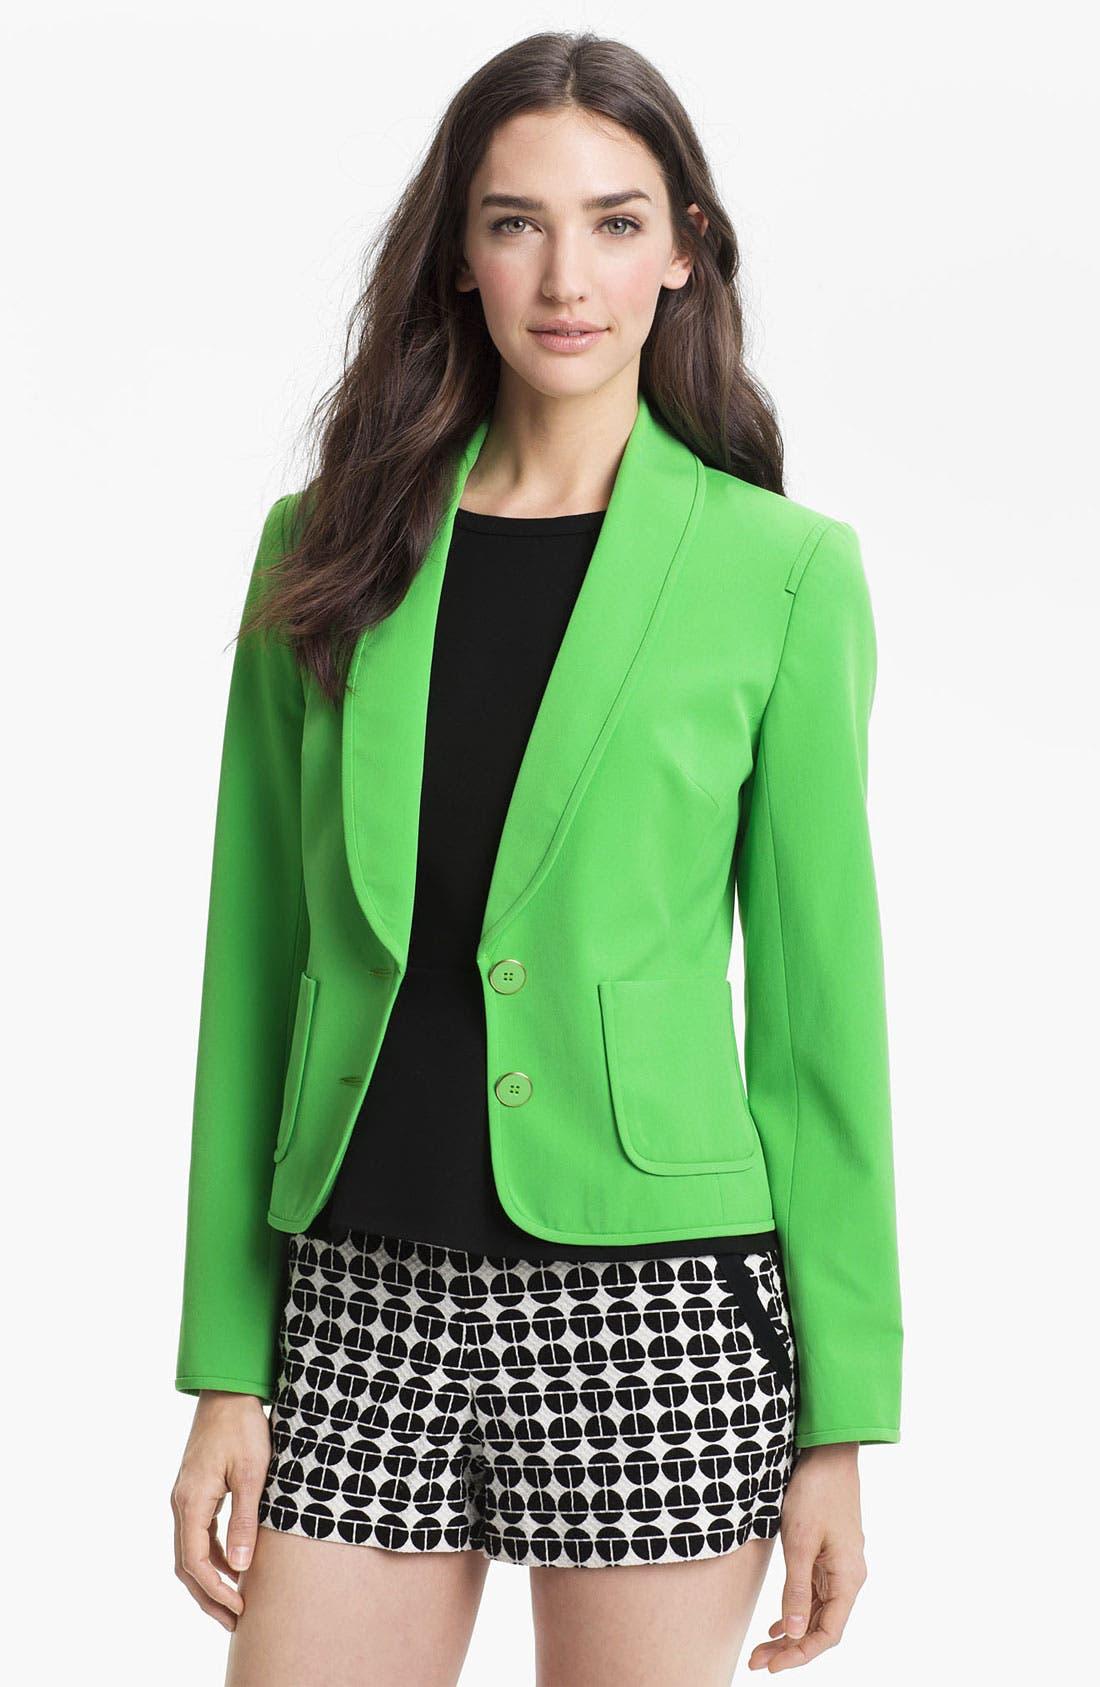 Alternate Image 1 Selected - Trina Turk 'Ricky' Jacket